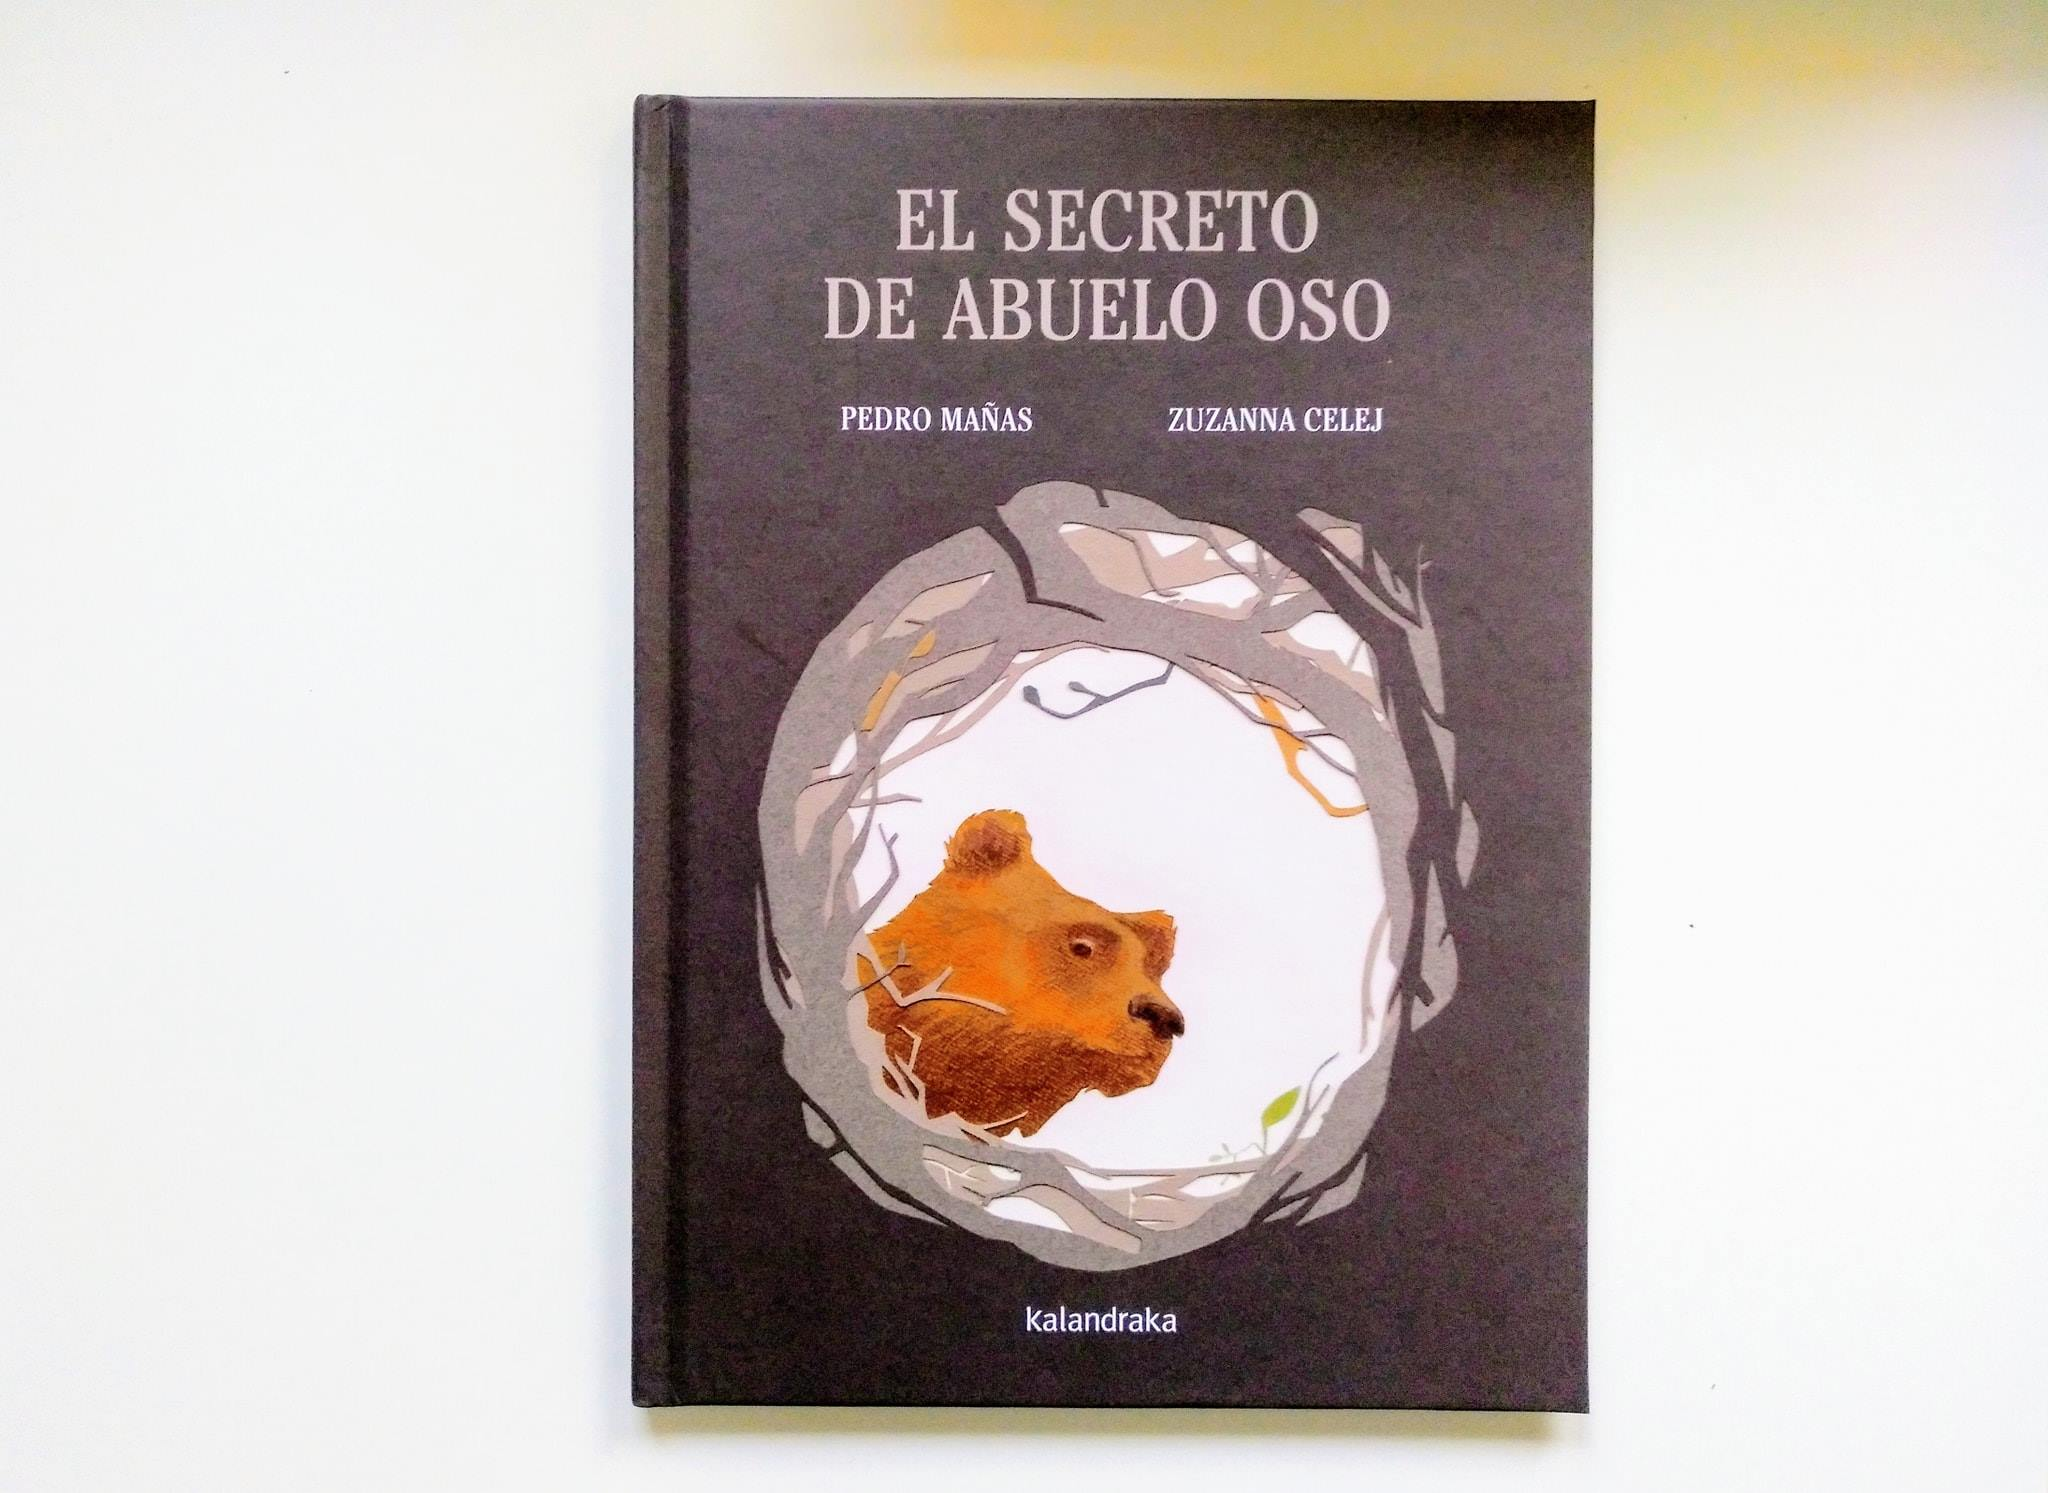 EL SECRETO DE ABUELO OSO RESEÑA